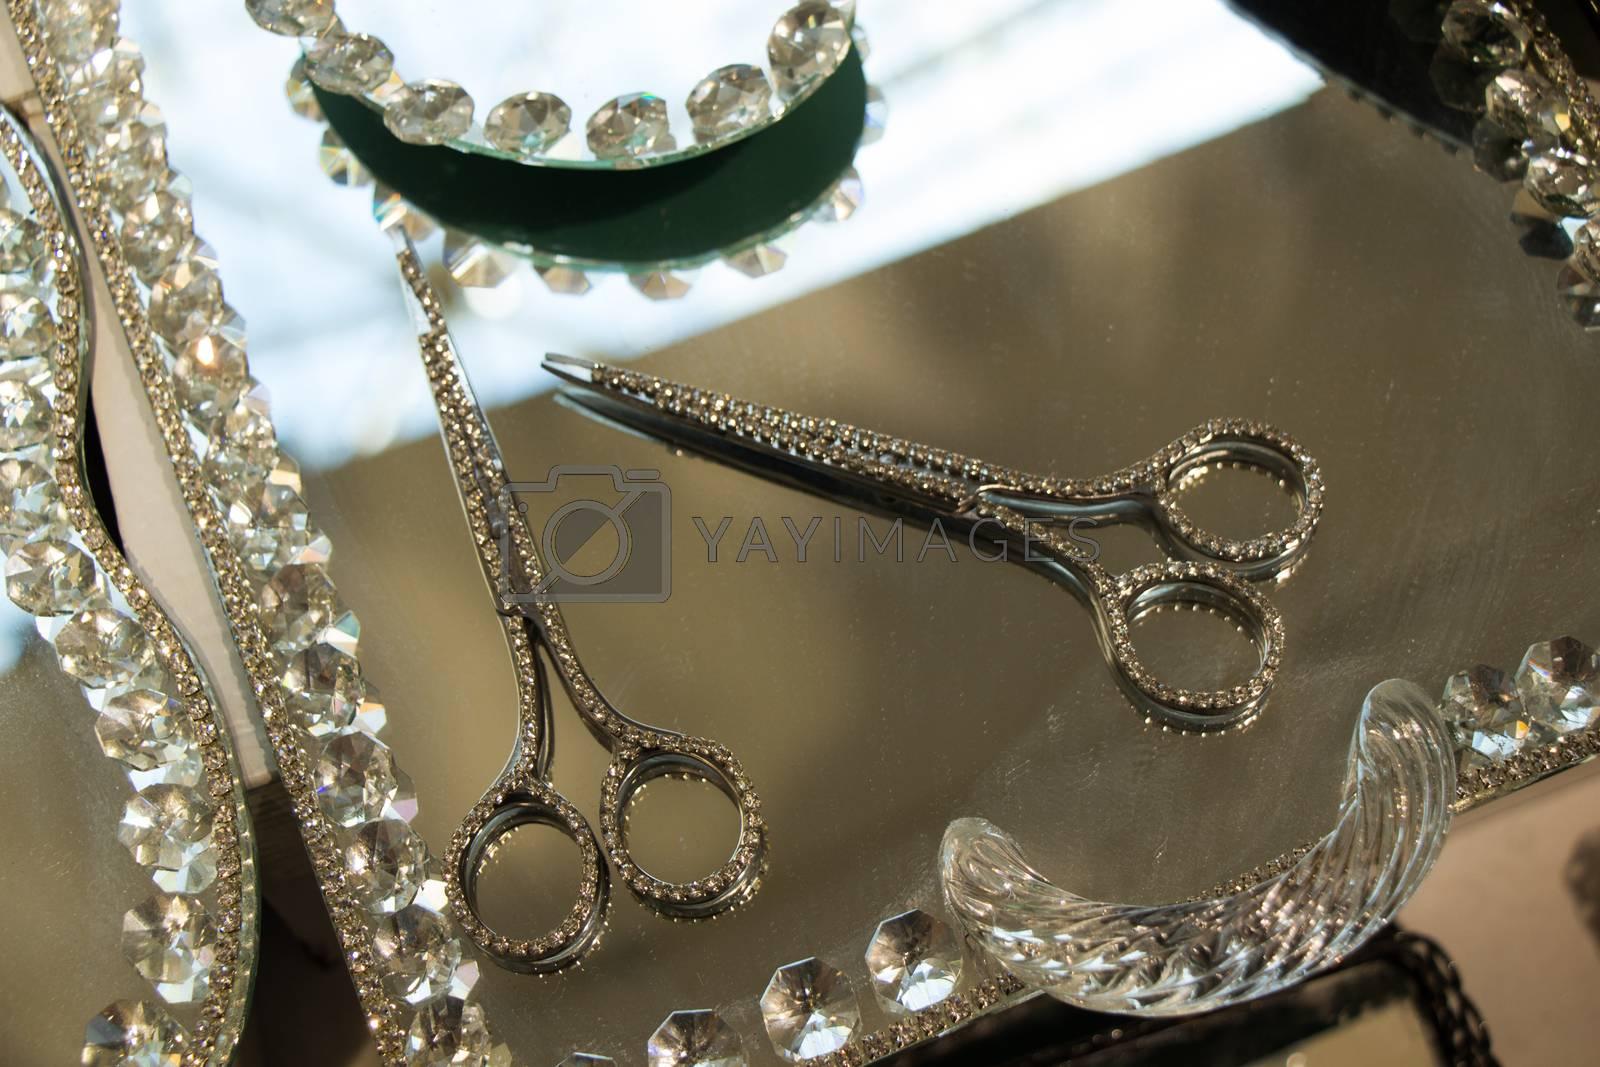 Metal scissors with diamonds on it on a mirror